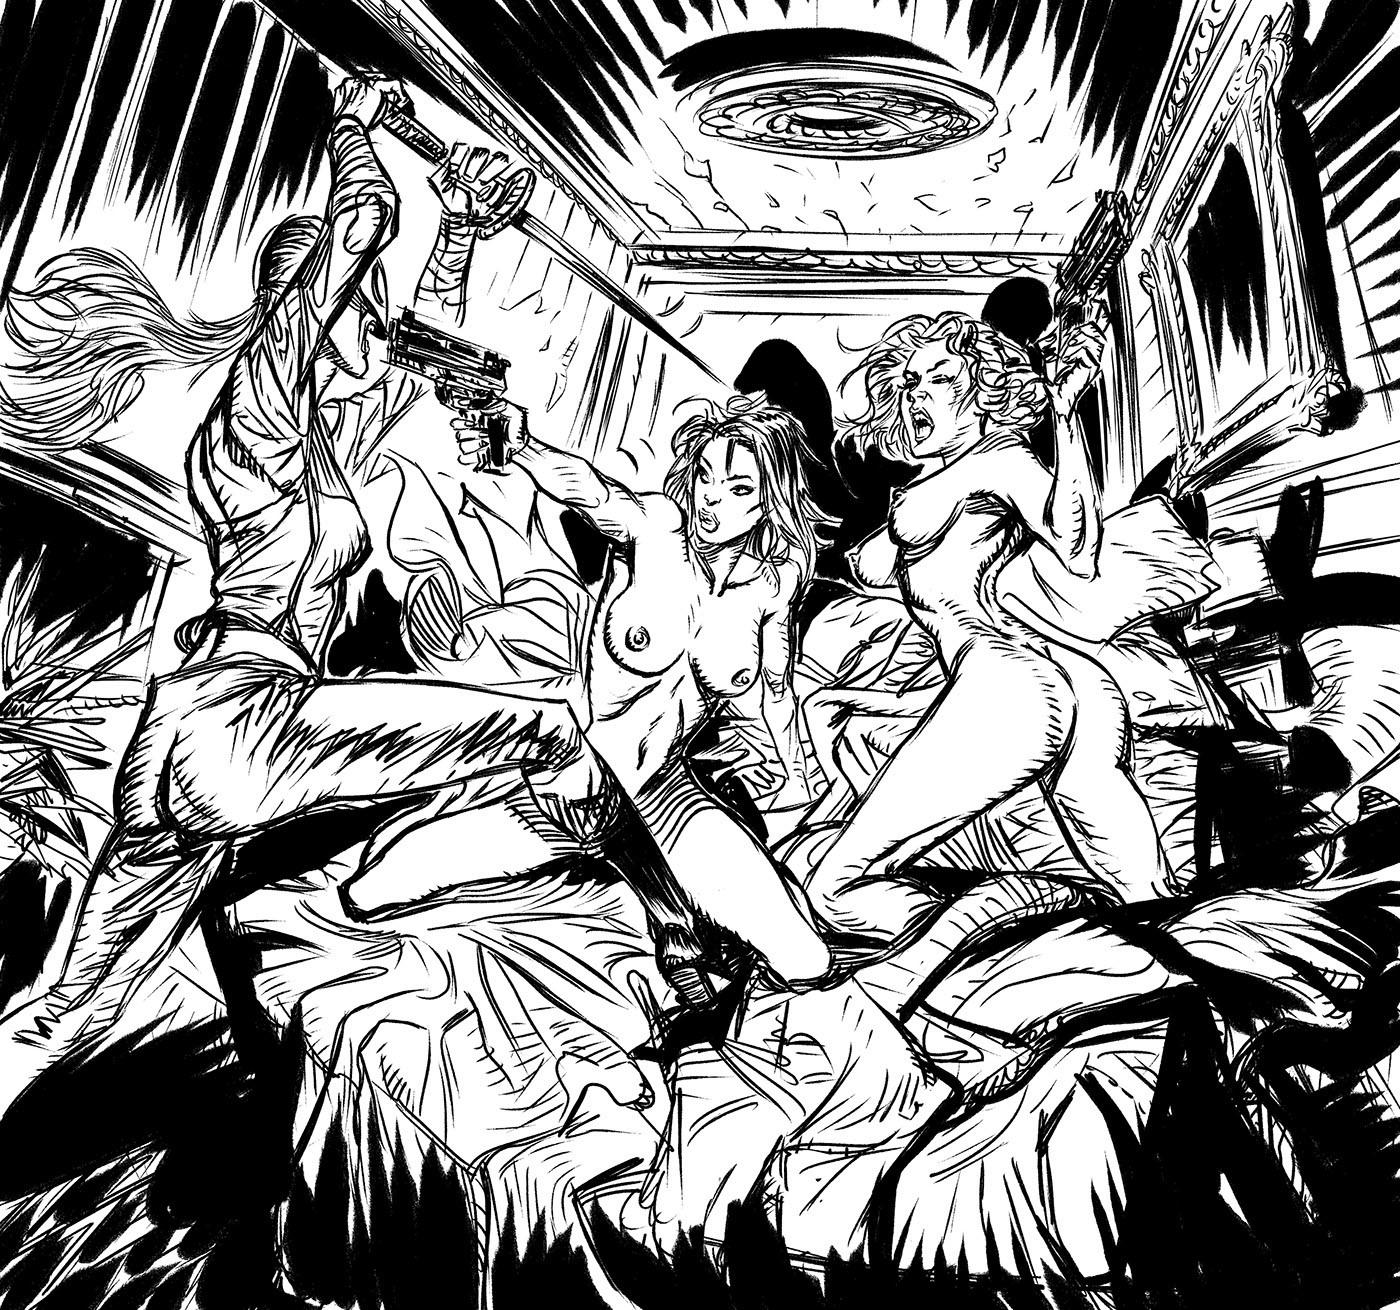 Daniele afferni natasha romanoff secret lovers the hydra assassin by danieleafferni ink